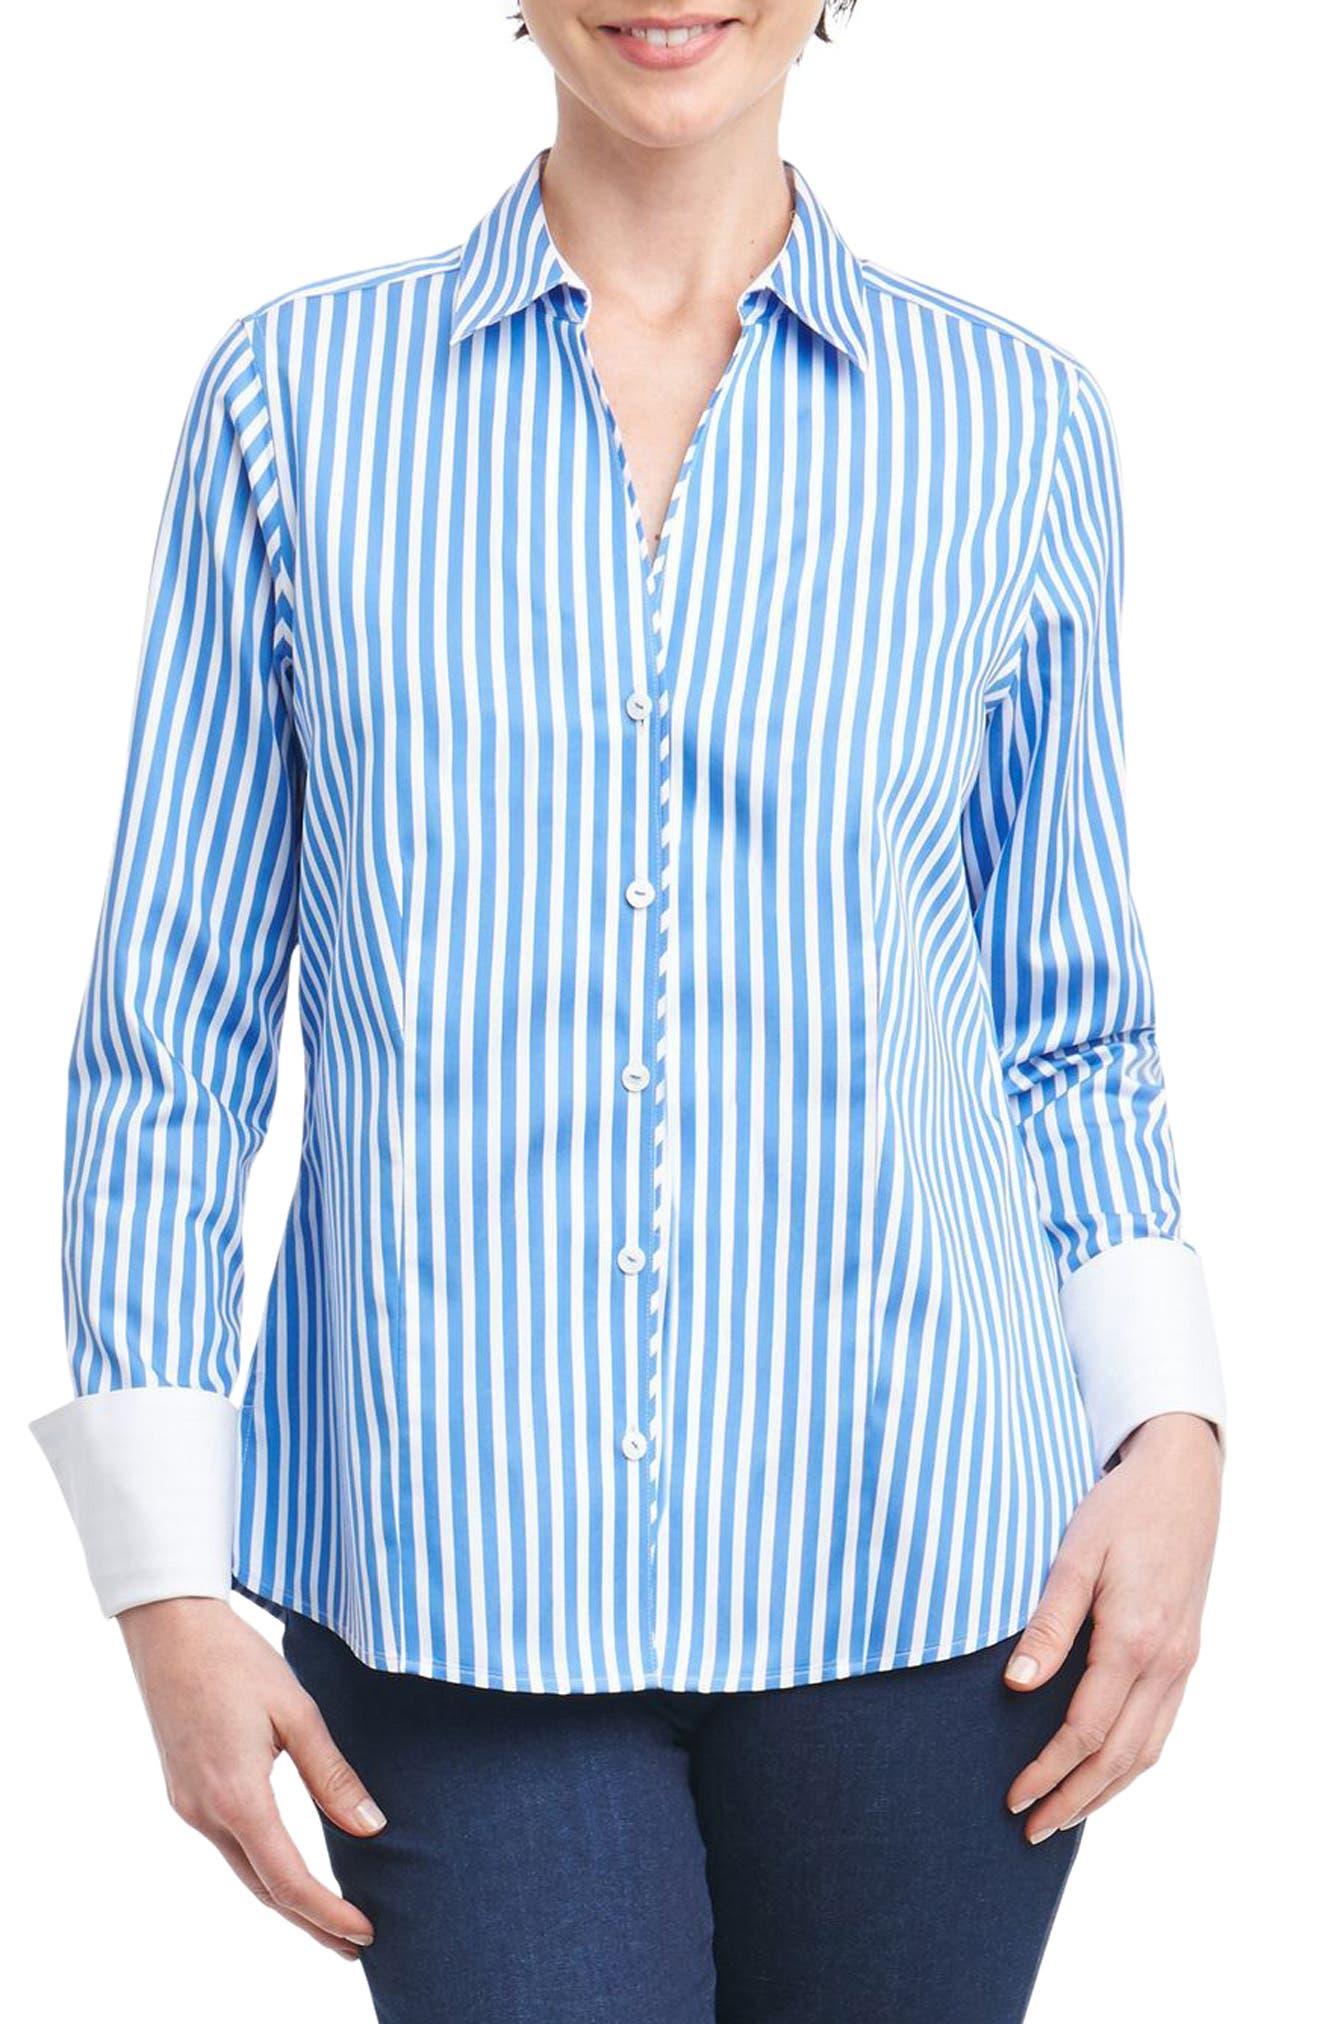 Alternate Image 1 Selected - Foxcroft Lauren Sateen Stripe Shirt (Regular & Petite)